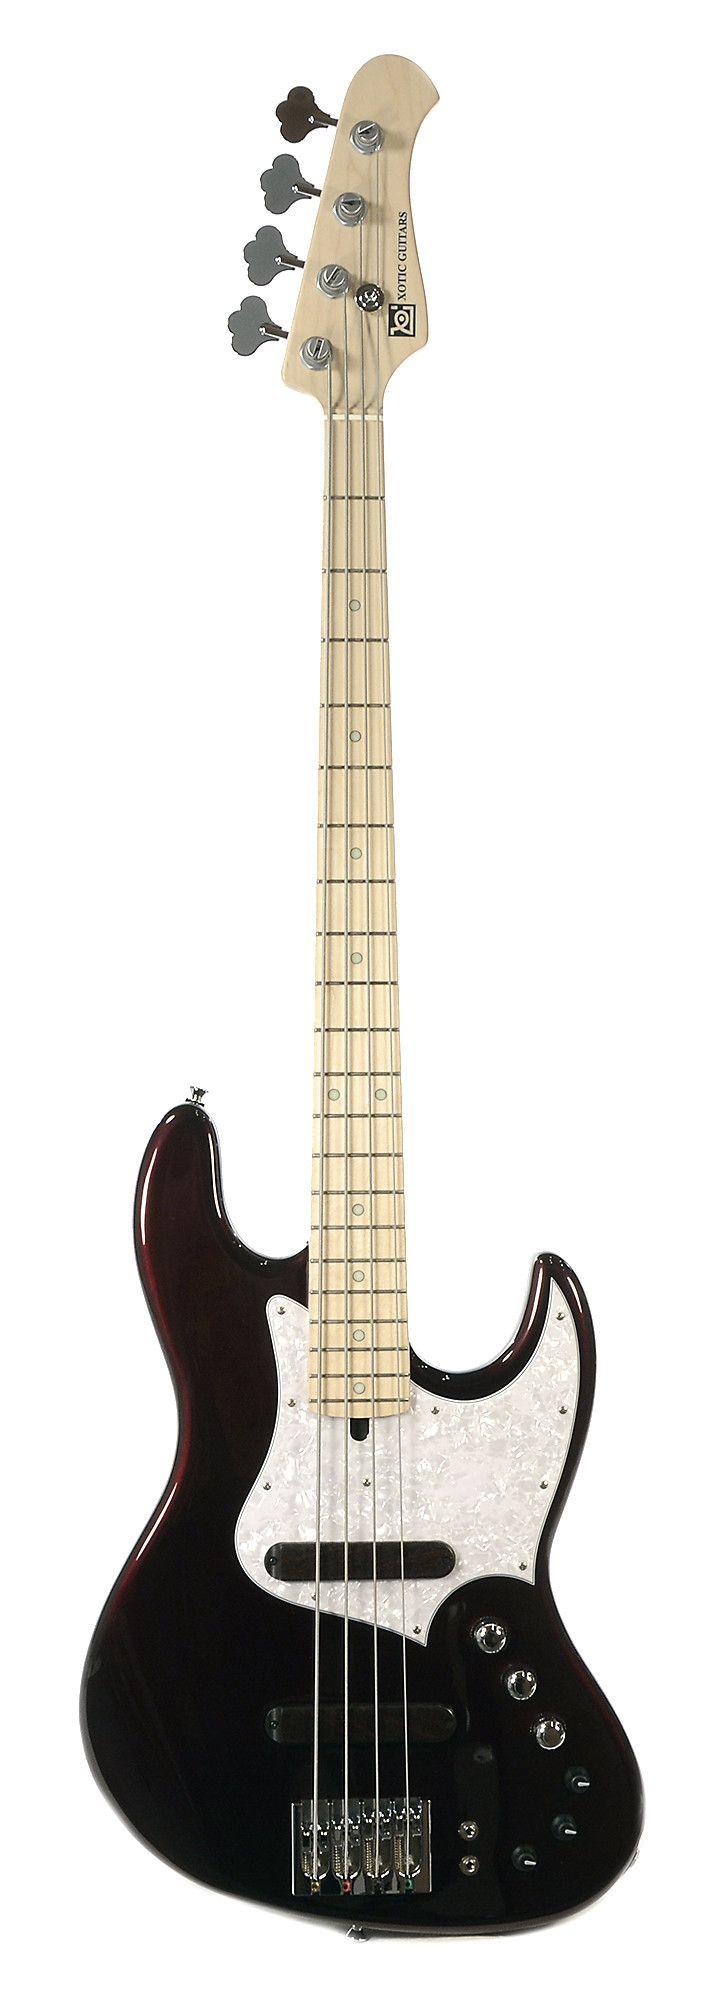 XOTIC XJ1T 4-String Bass Black Cherry | Chicago Music Exchange